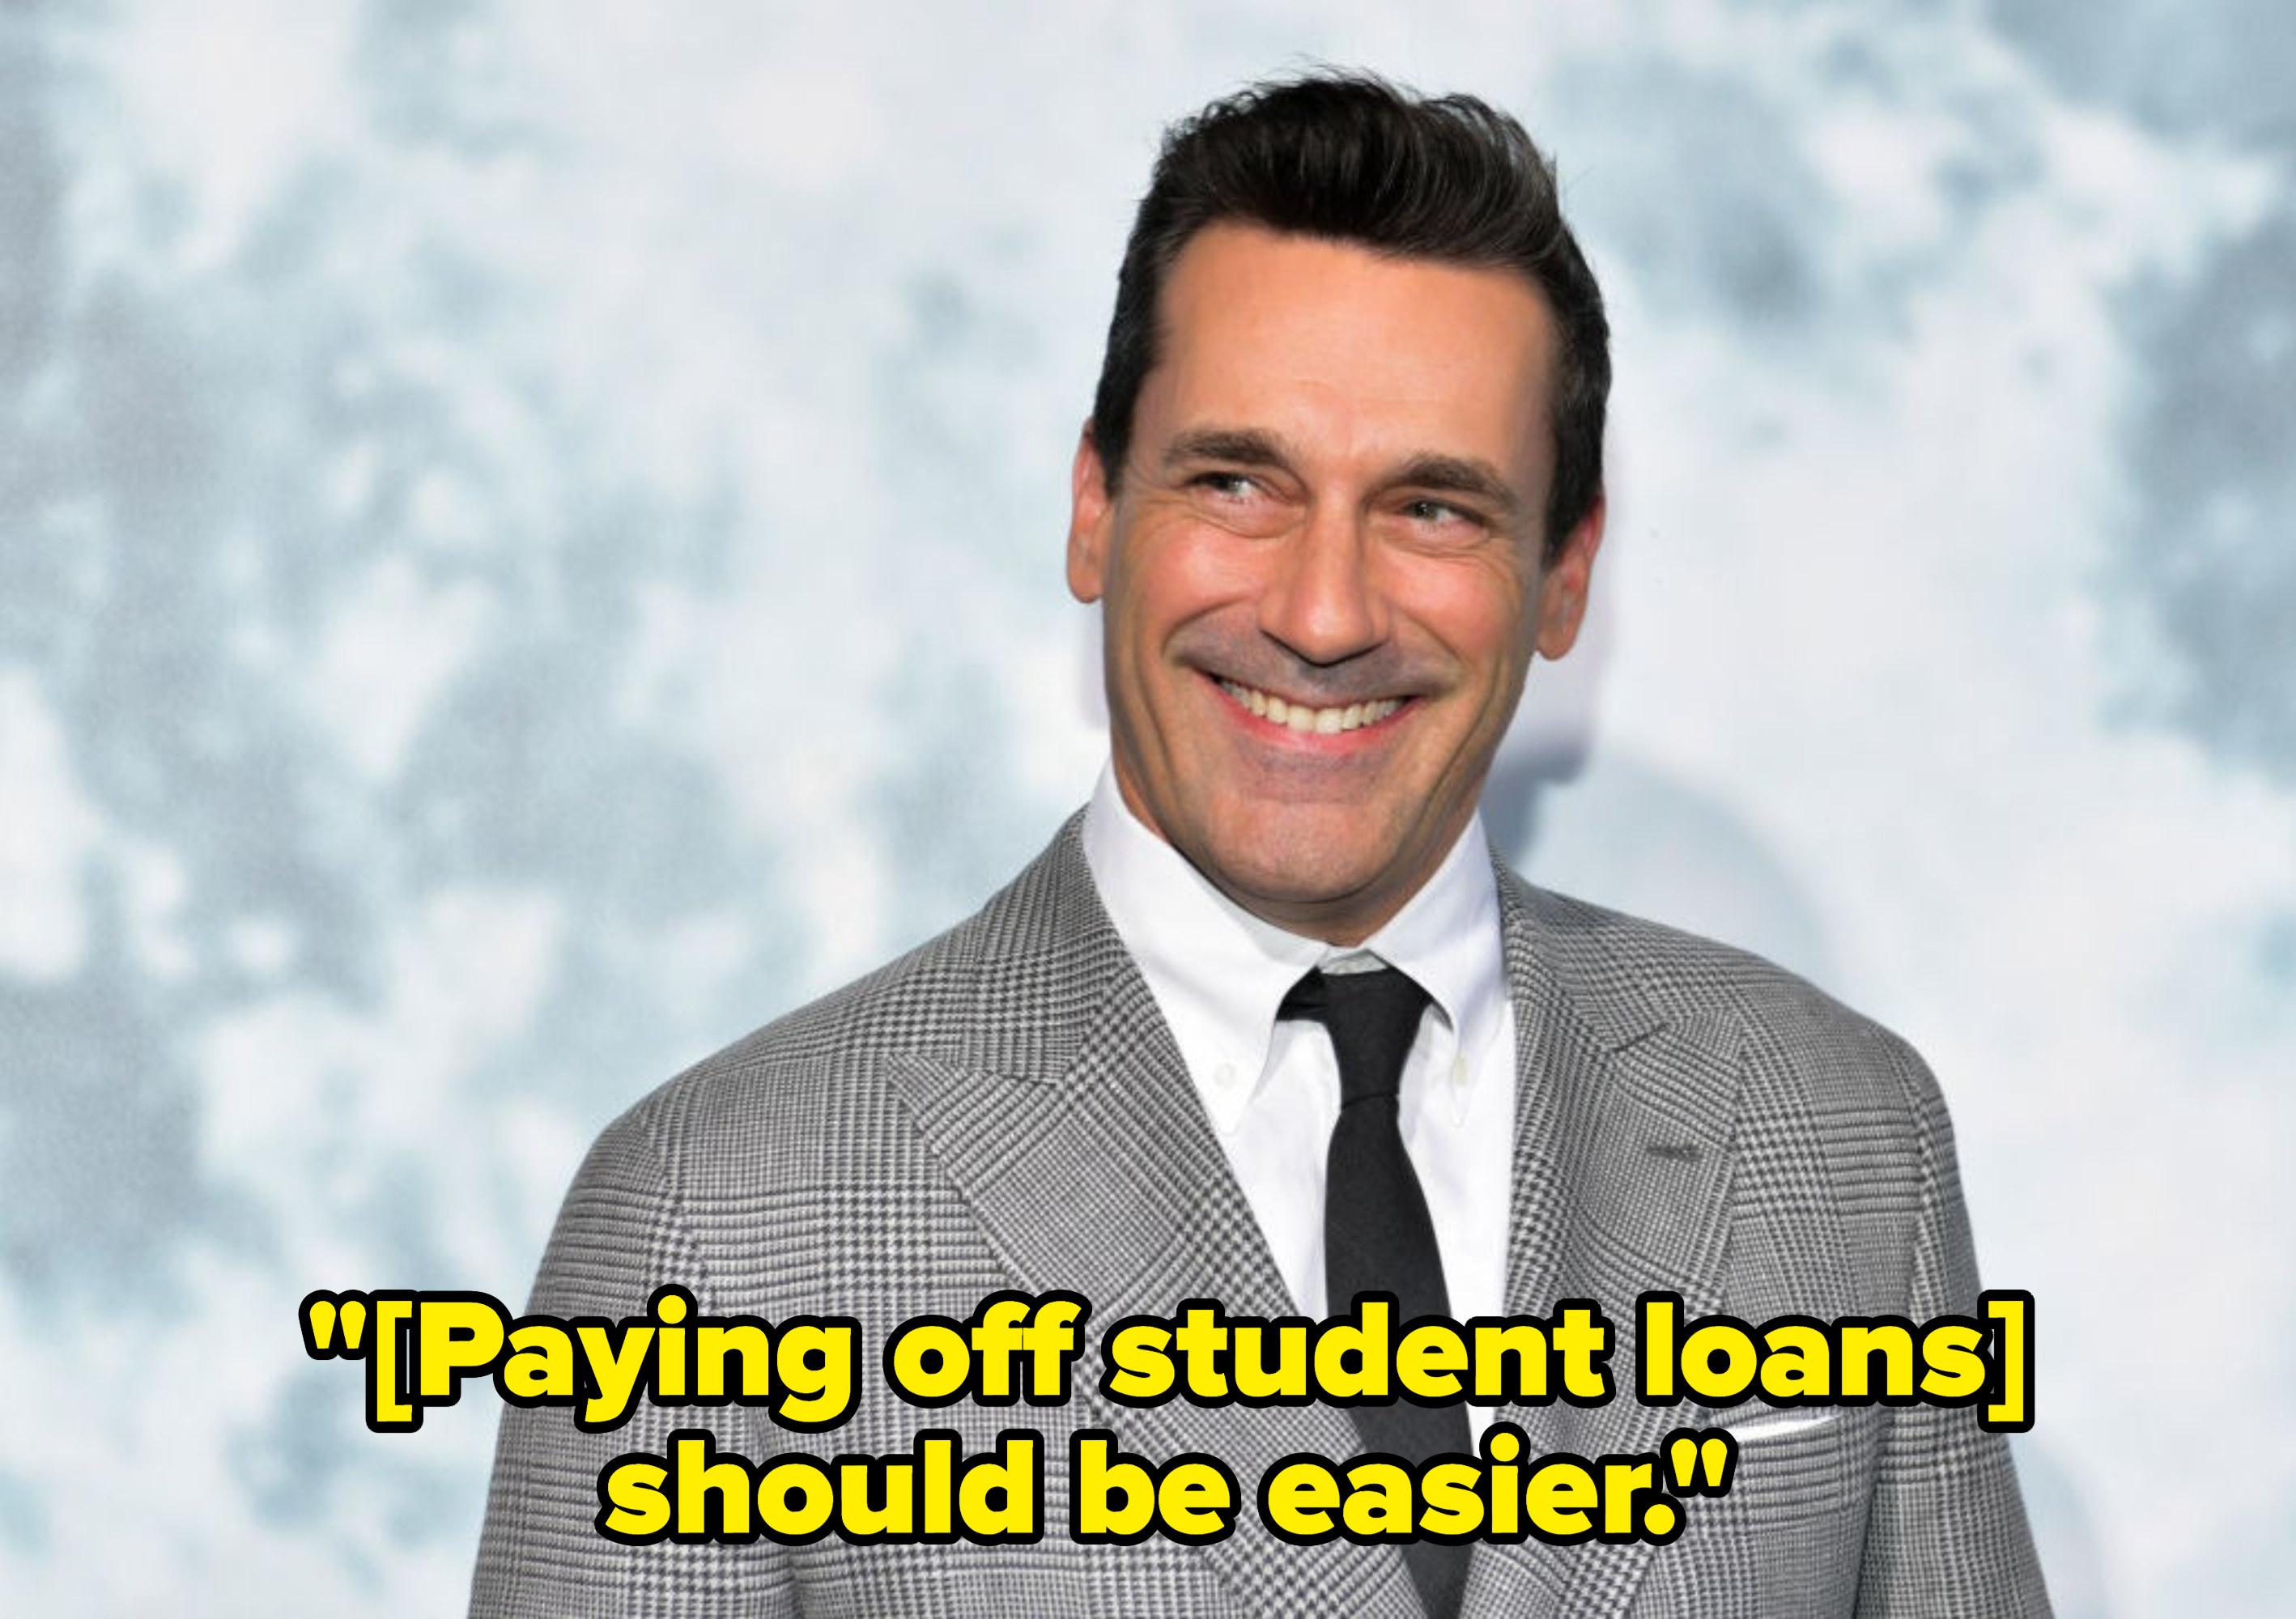 Student loan debt, John Hamm - graduated University of Missouri in 1993.